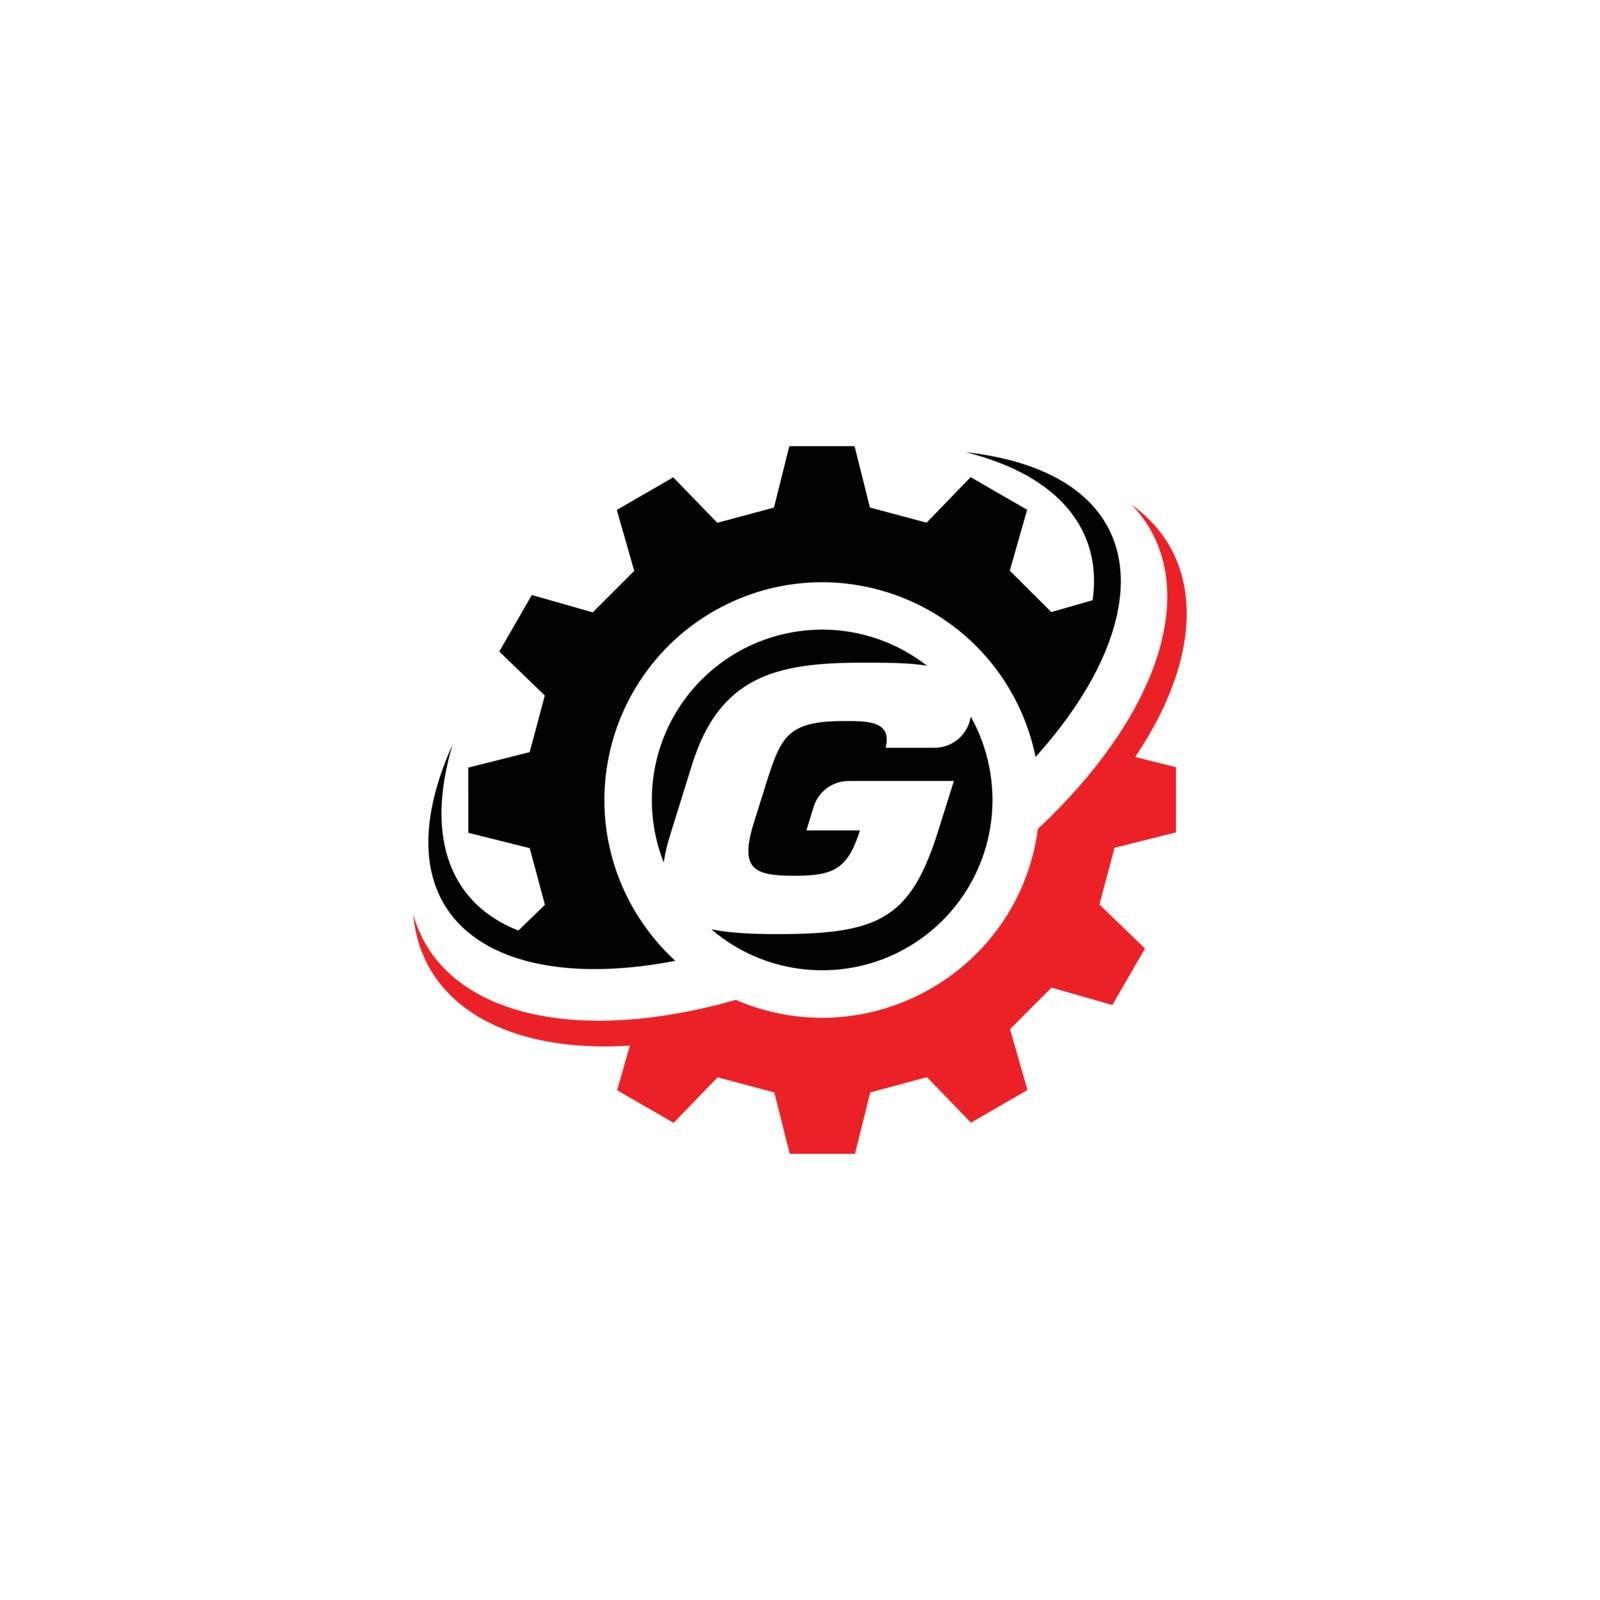 Letter G Gear Logo Design Template